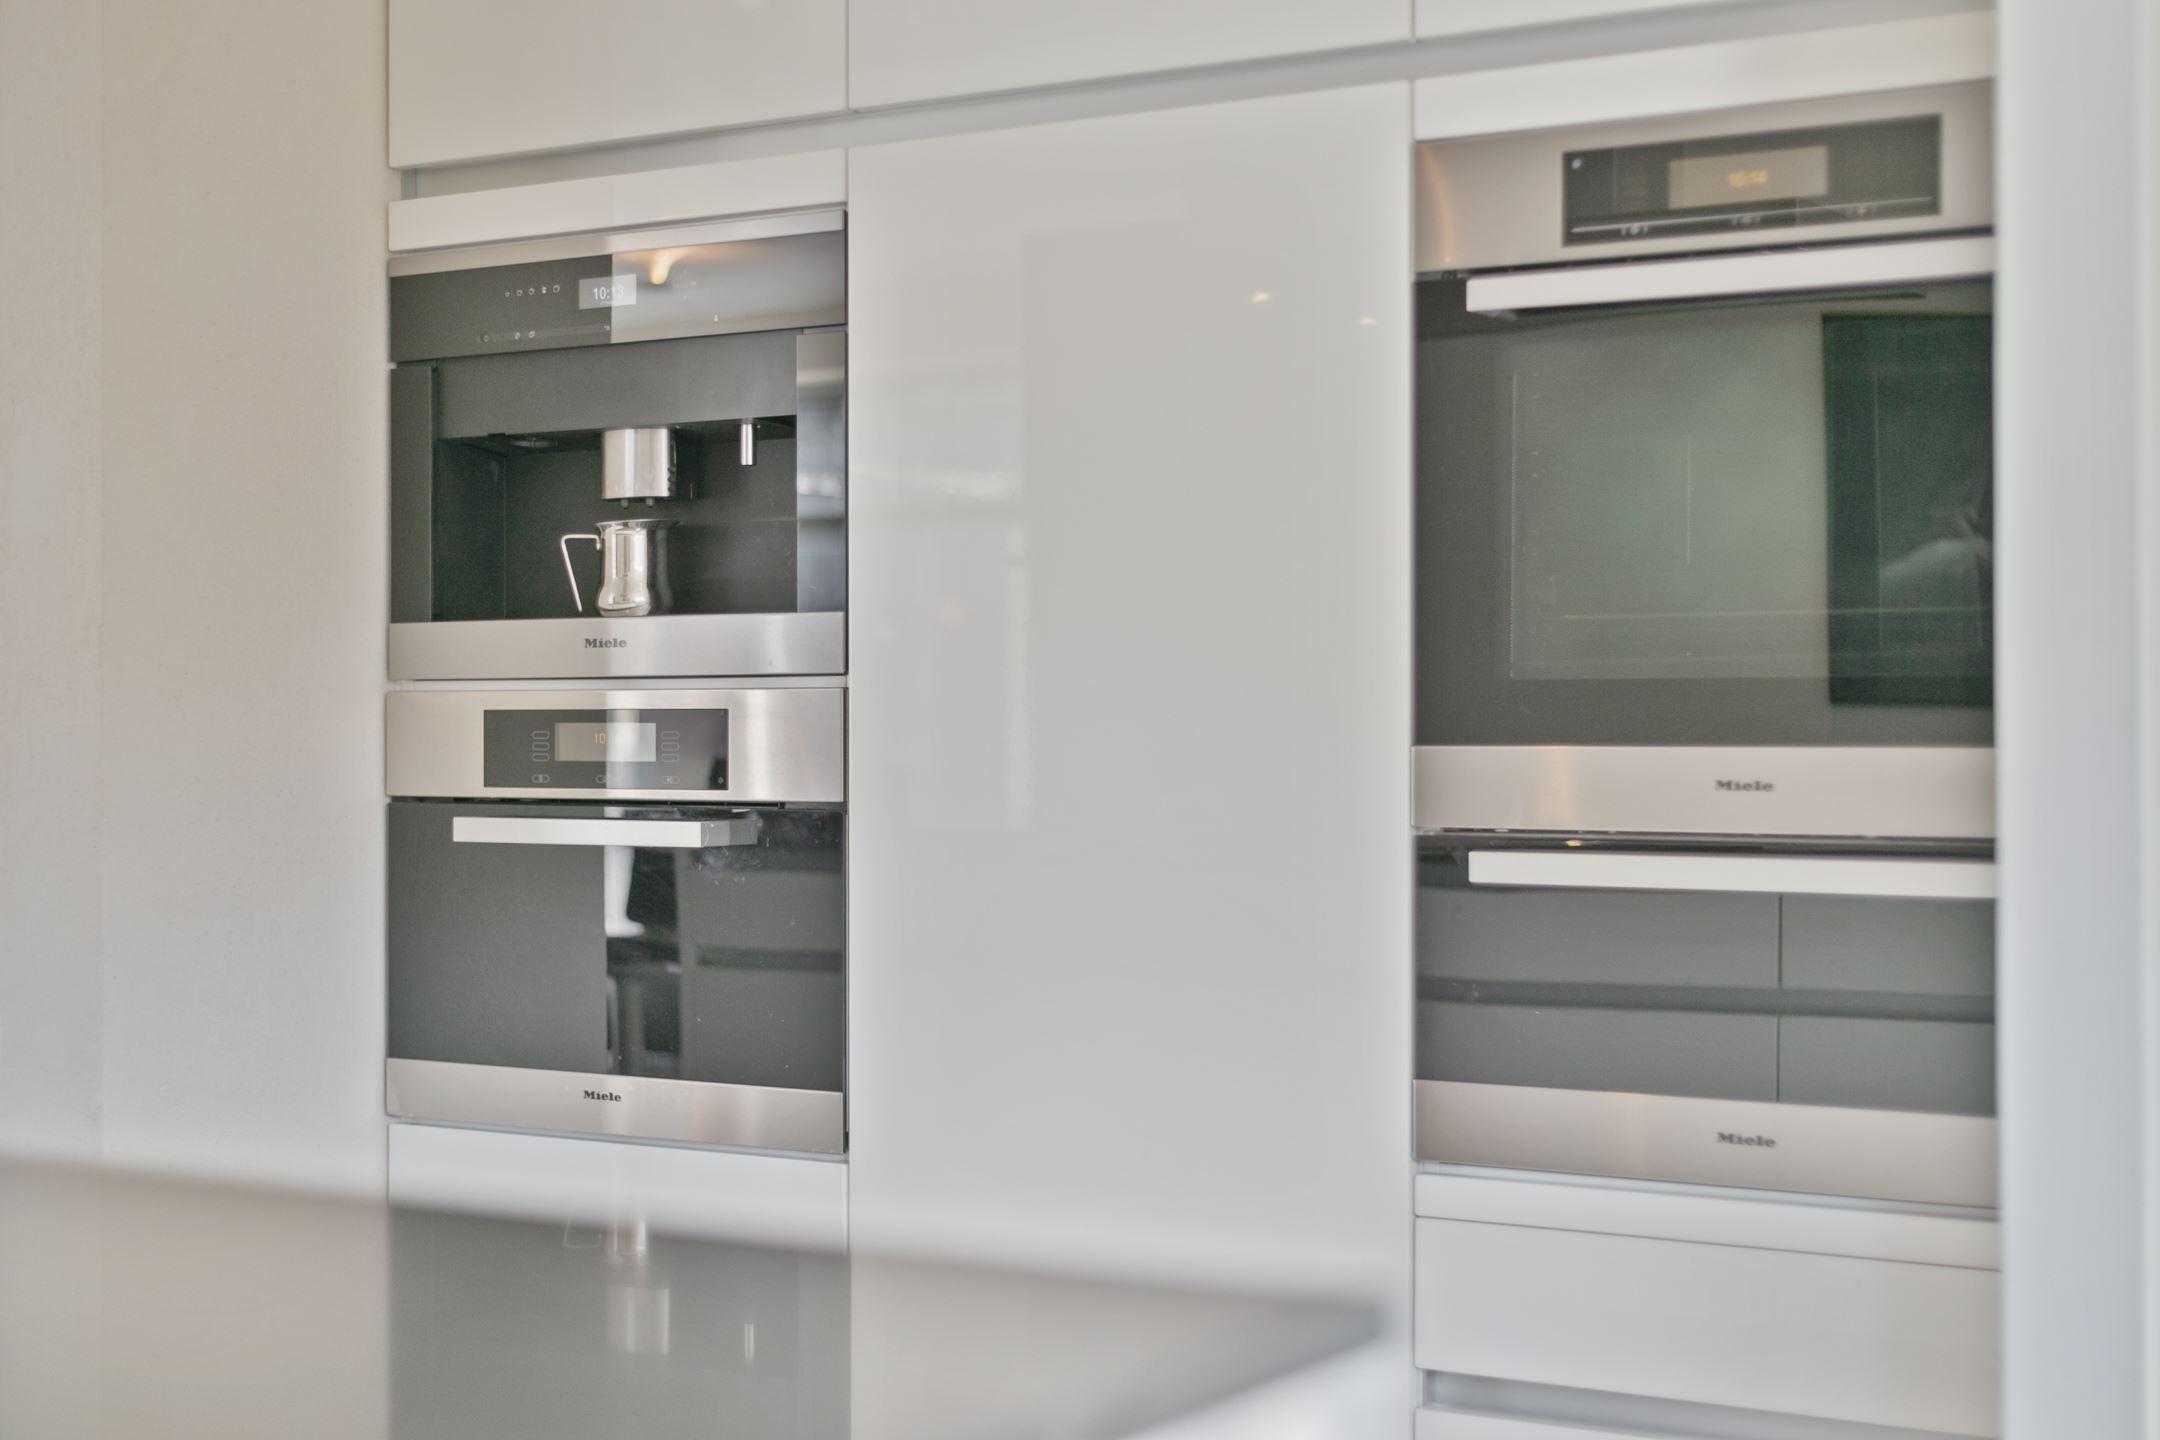 Keuken Badkamer Zutphen : Huis te koop: canadasingel 11 7207 rn zutphen [funda]